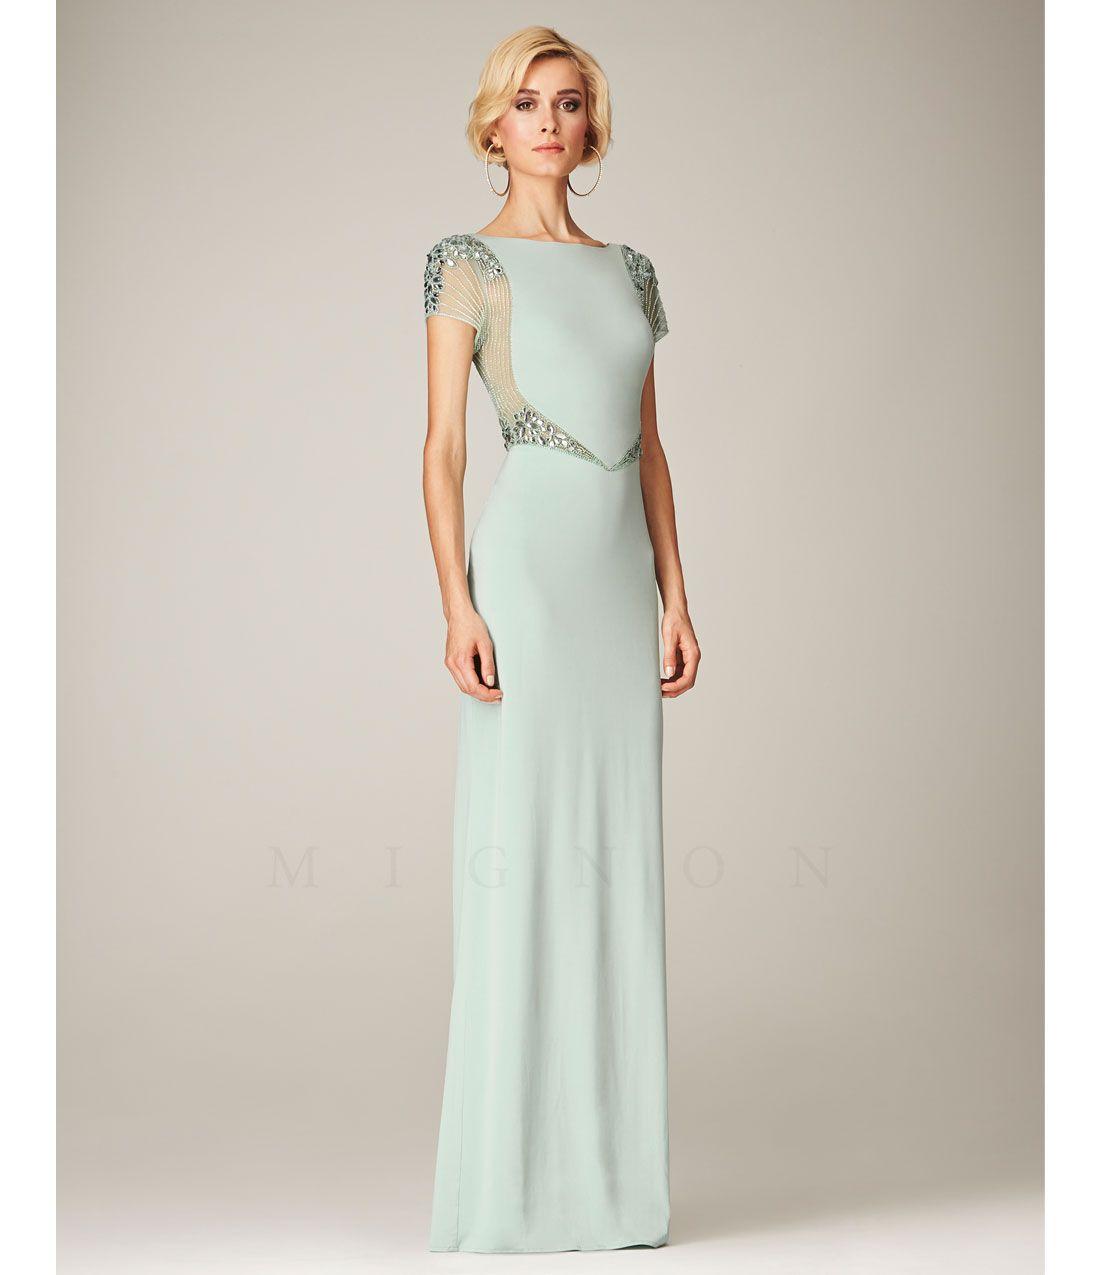 s Formal Dresses Formal Dress formal and Prom